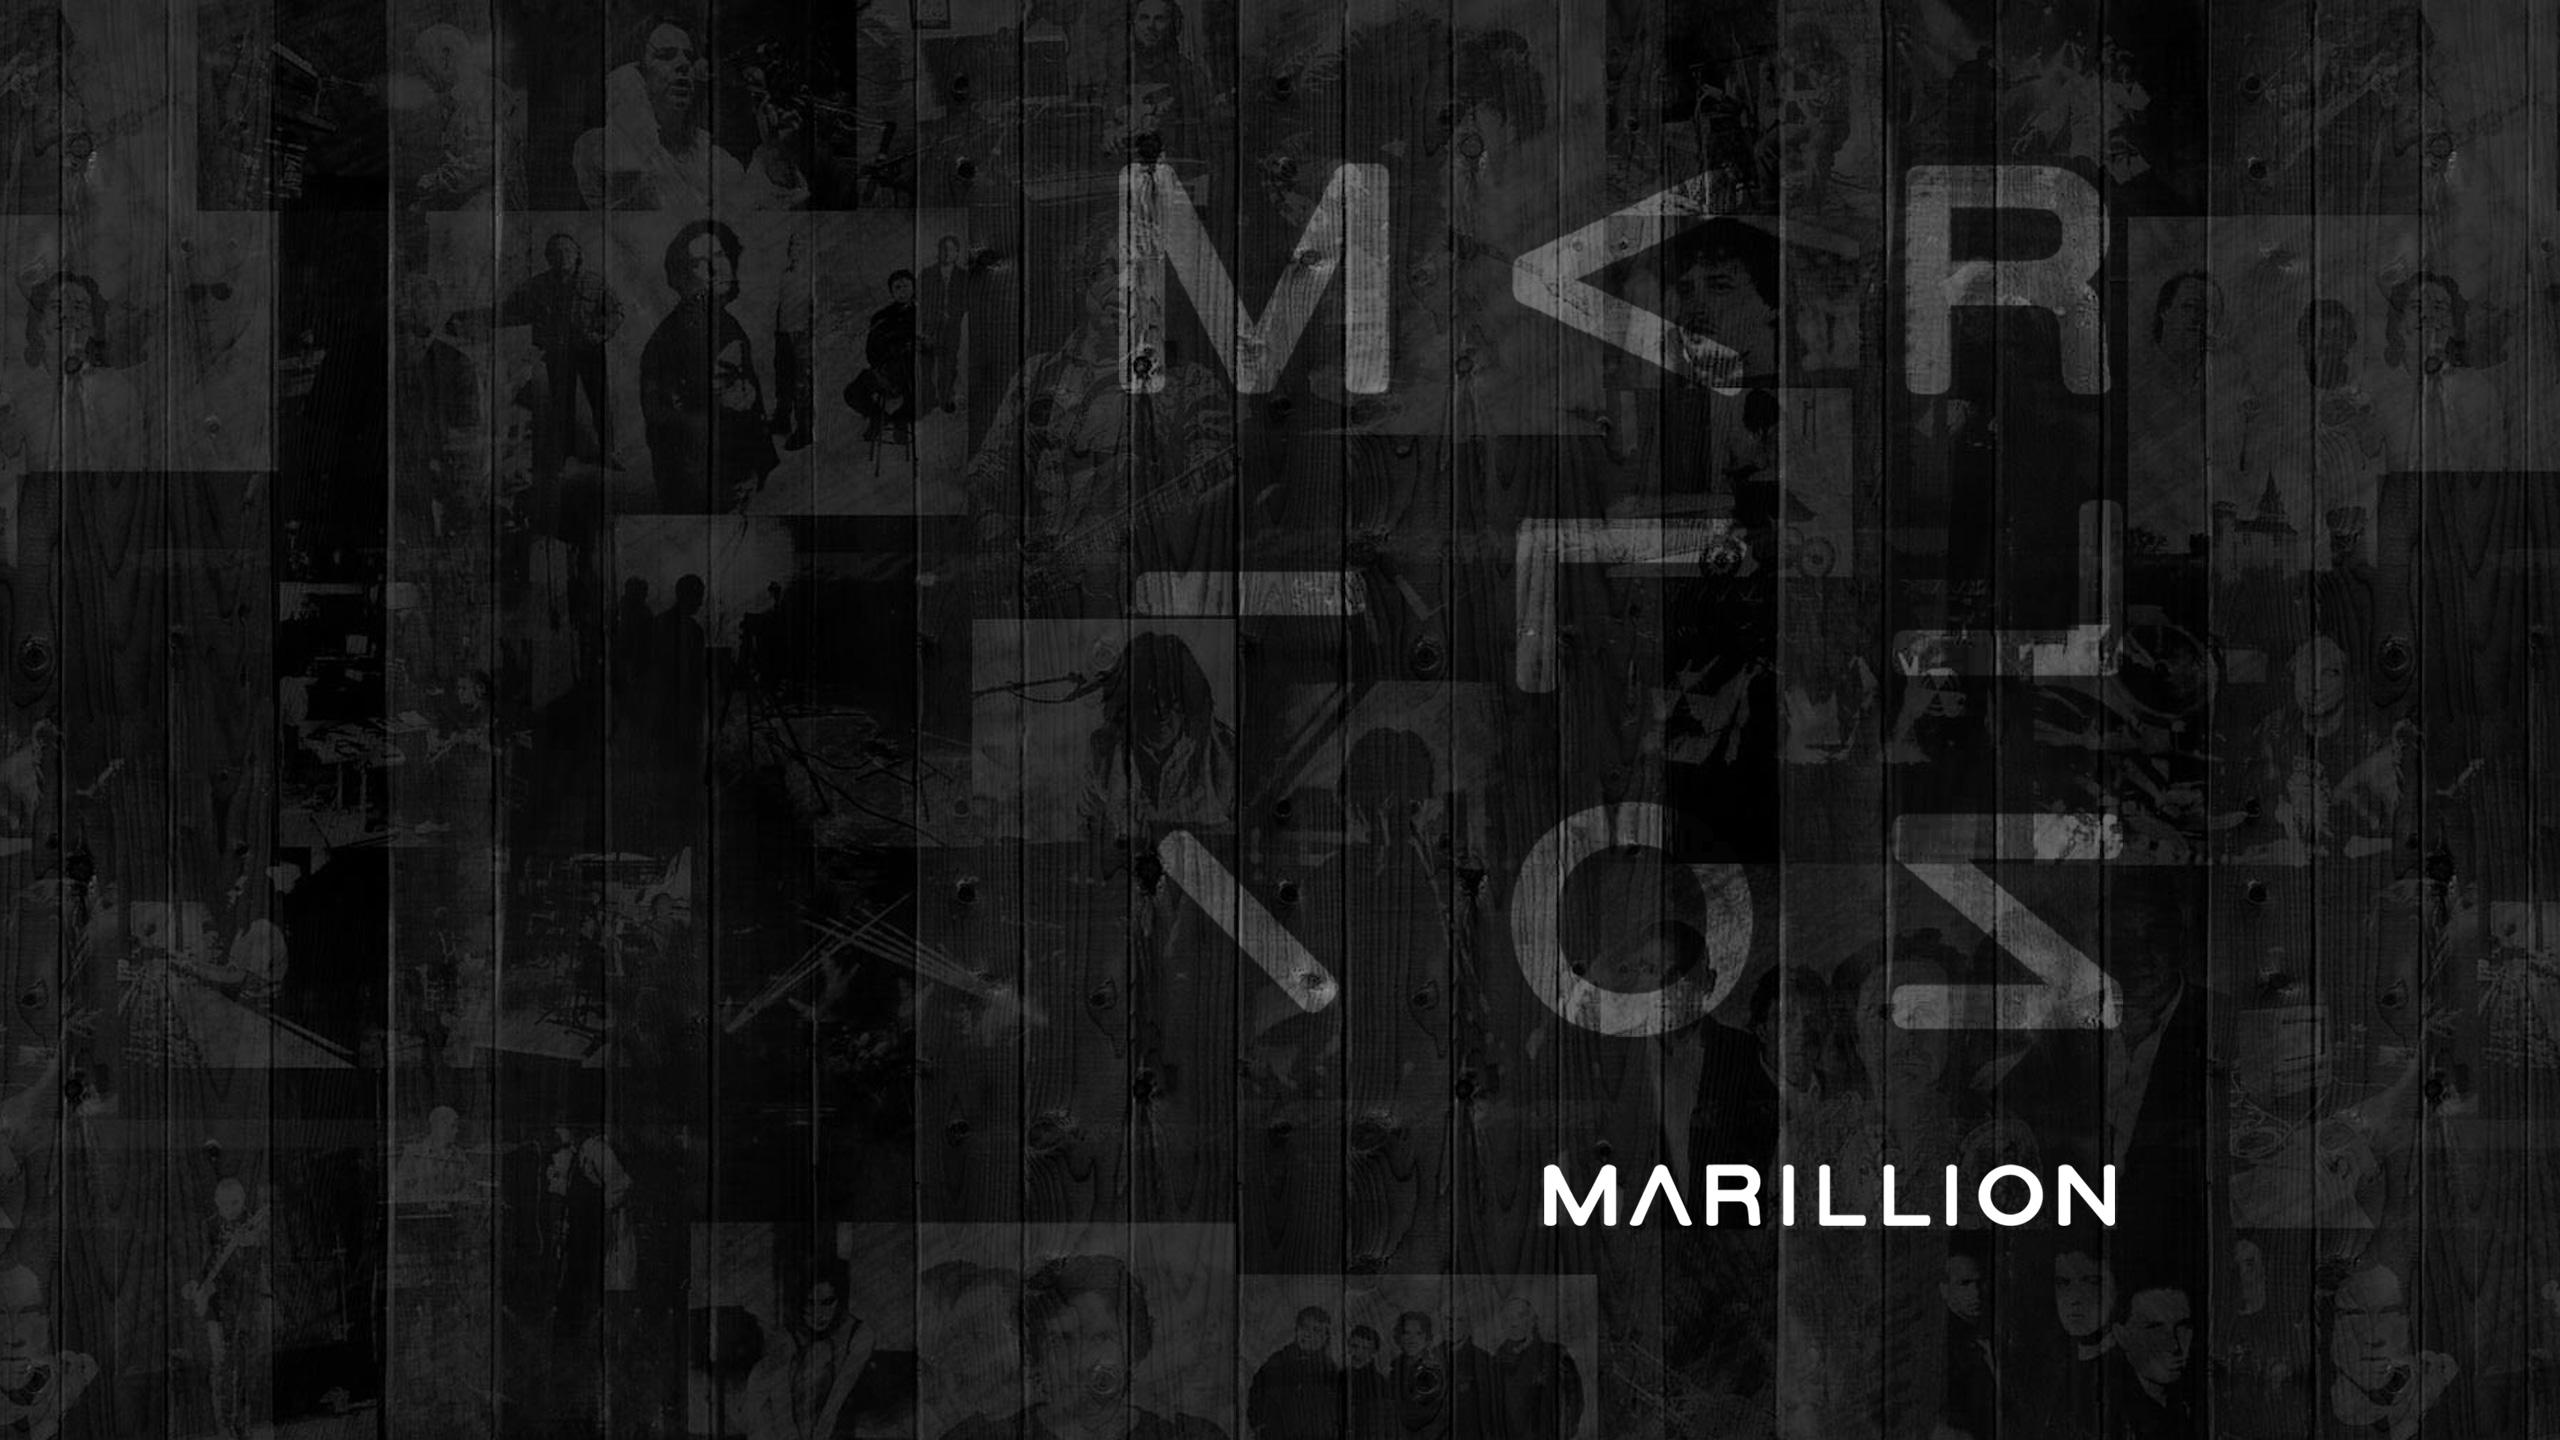 Marillion Backgrounds on Wallpapers Vista